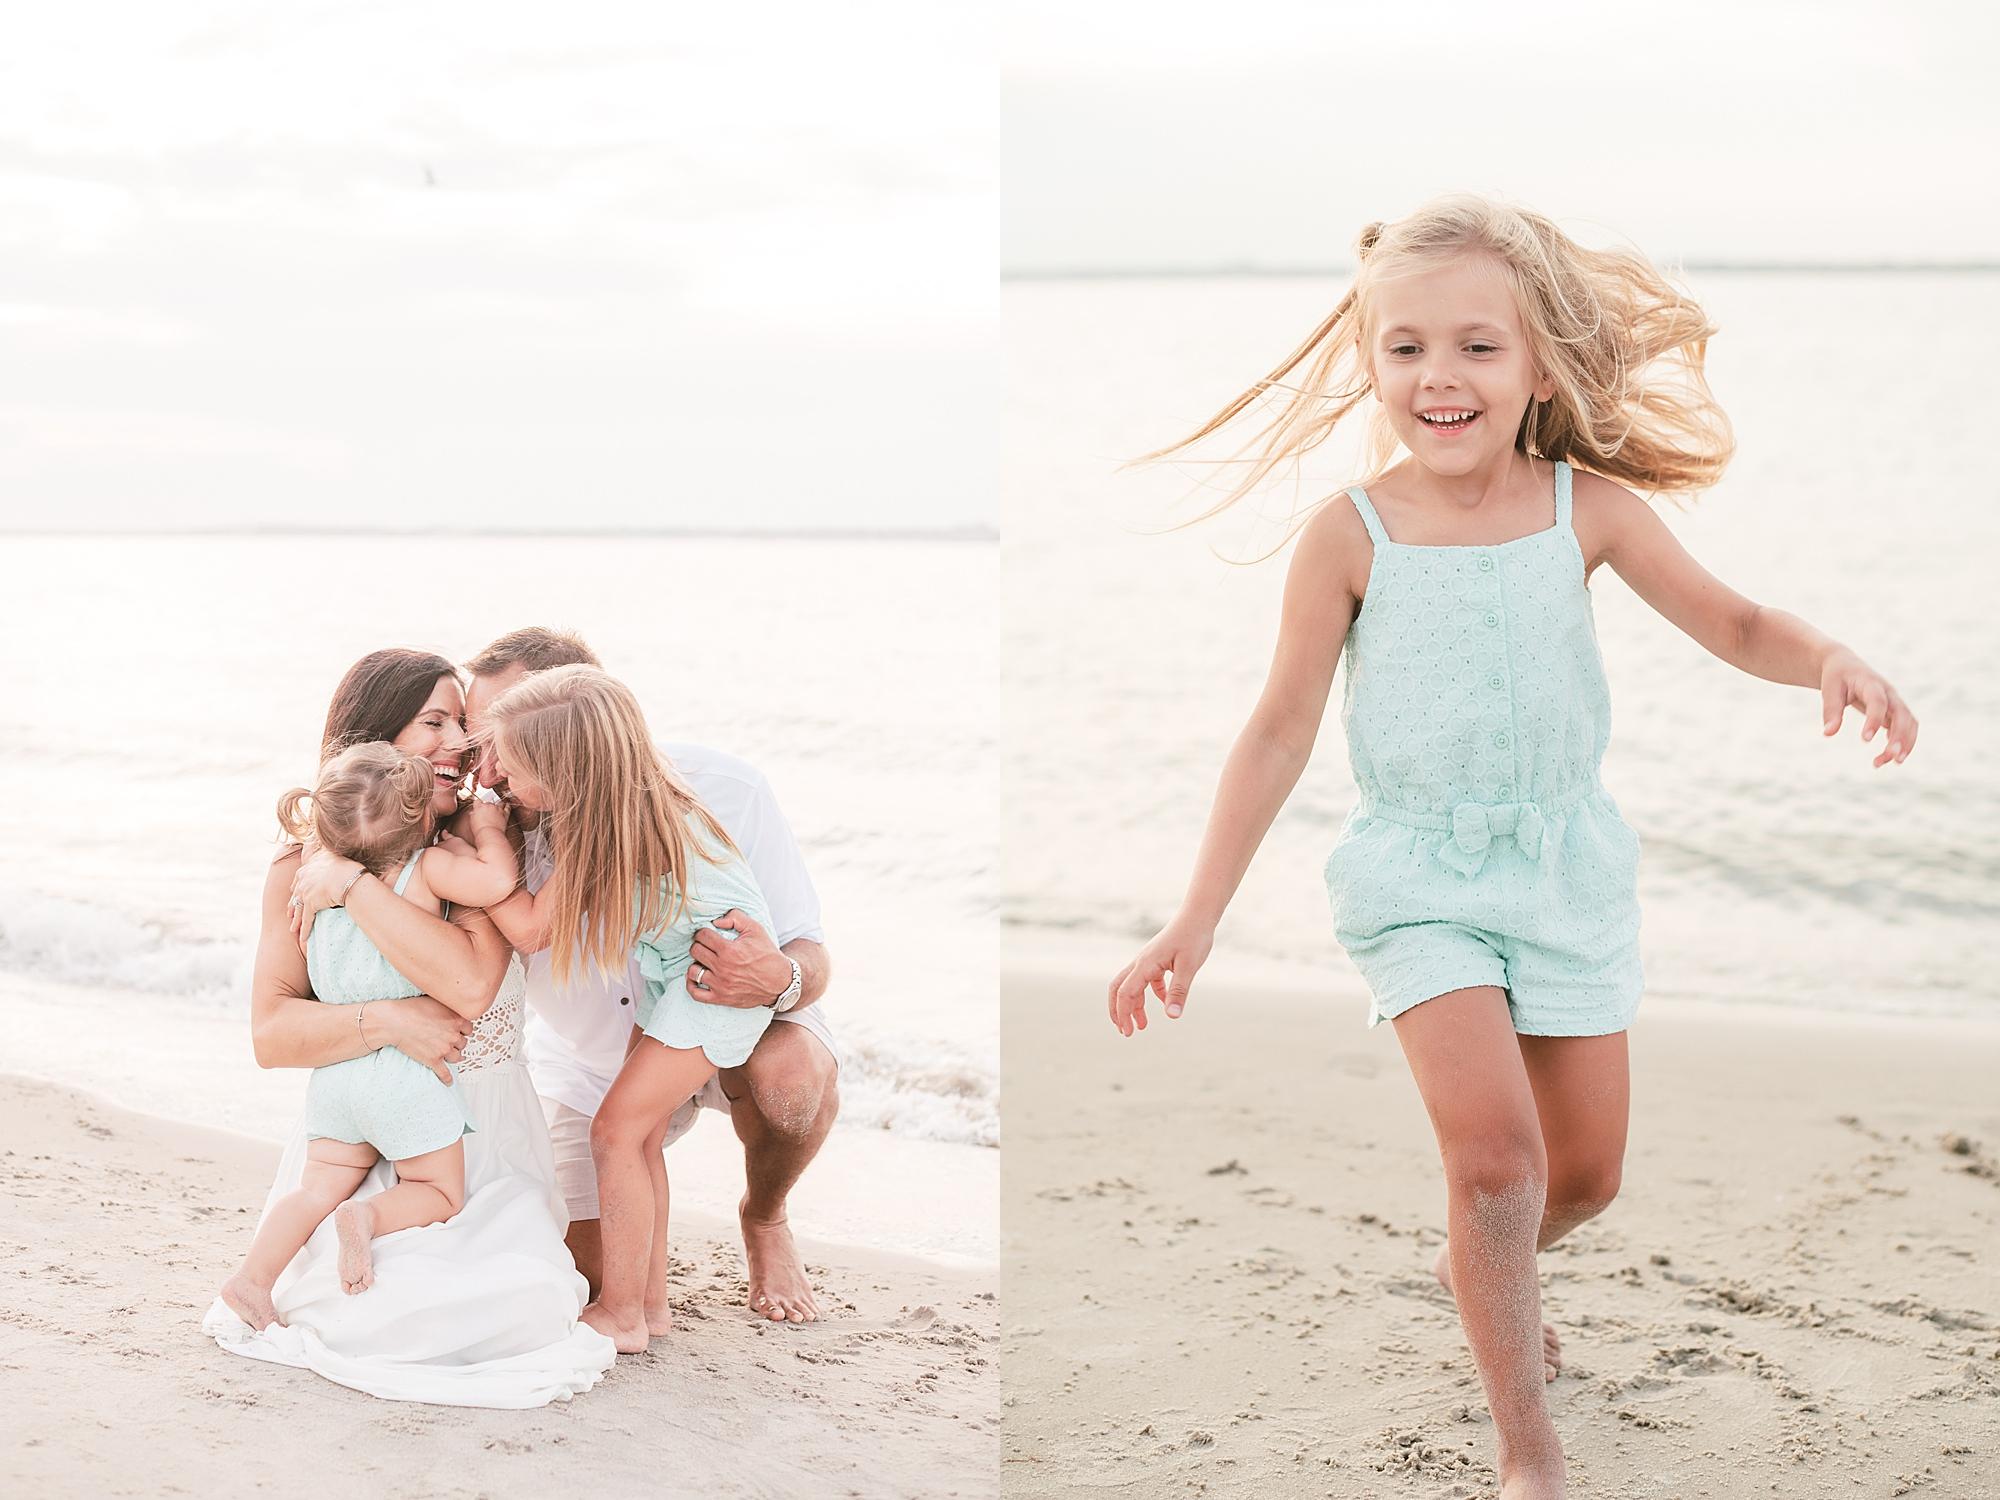 Ocean City NJ Beach Family Photos Best of 2019 by Magdalena Studios11